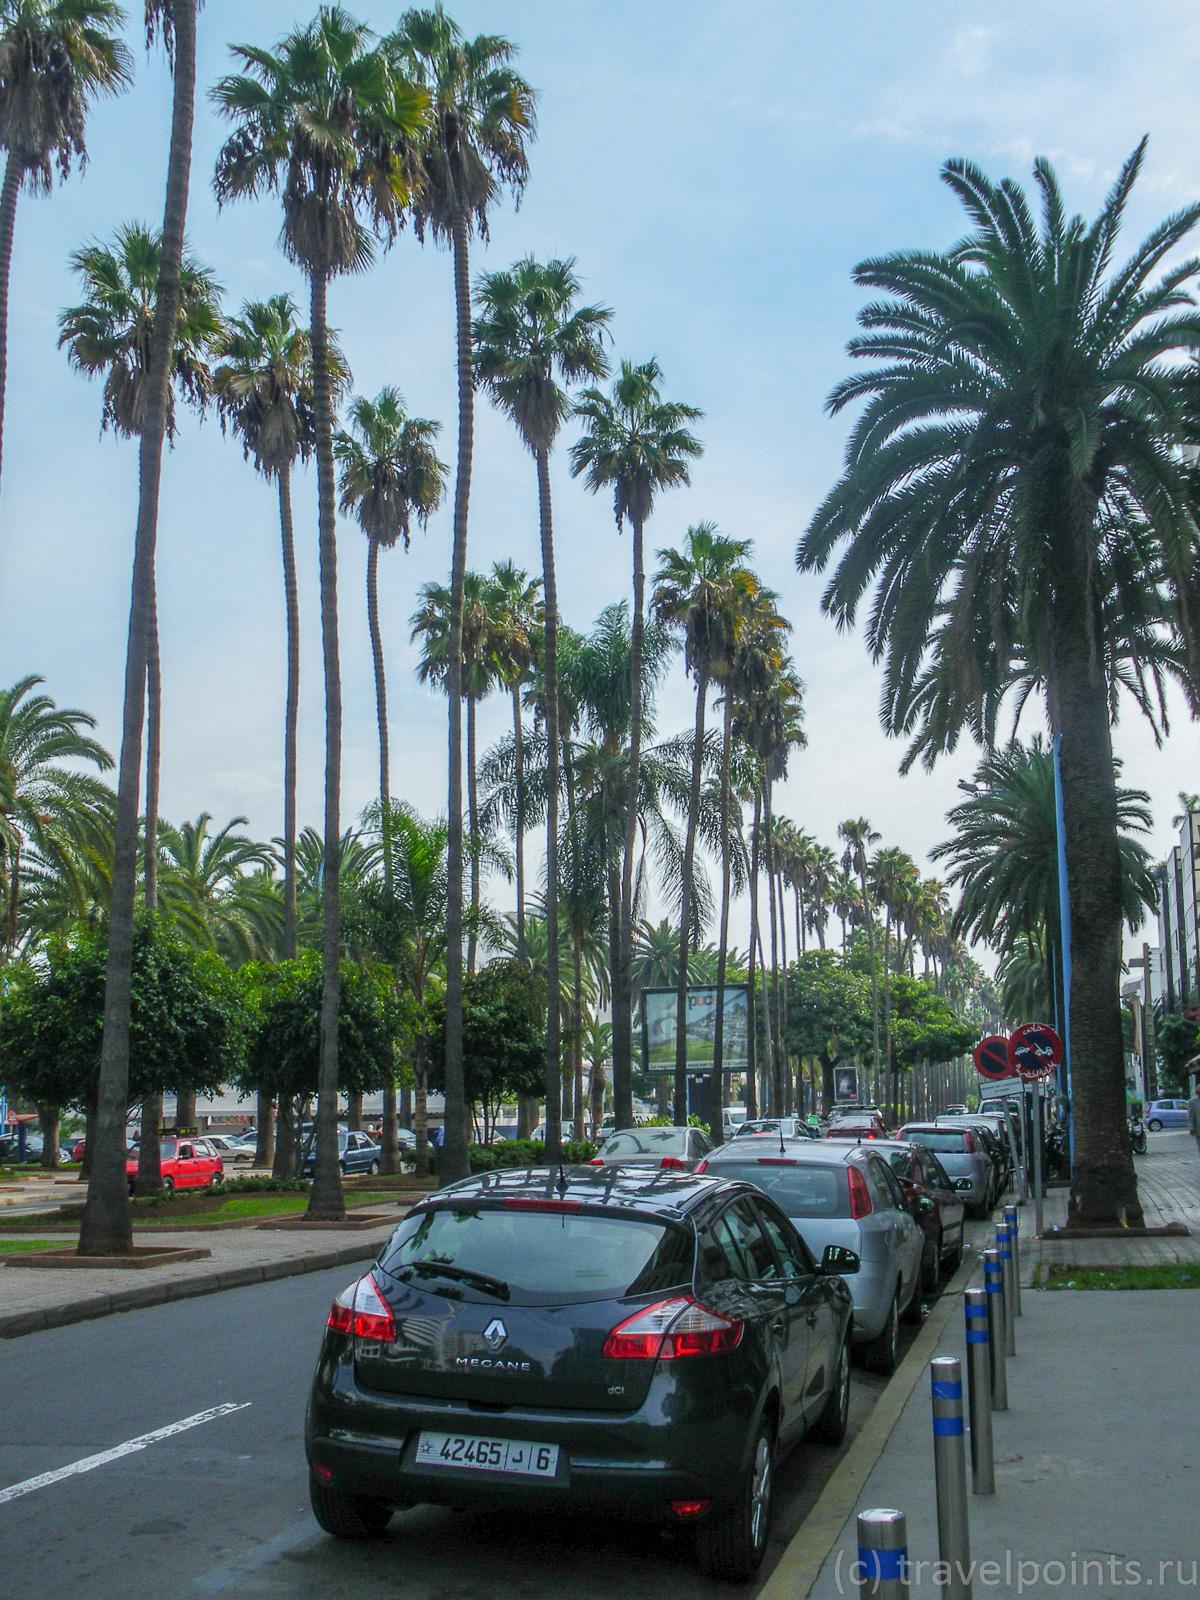 Улицы Касабланке, которые почище